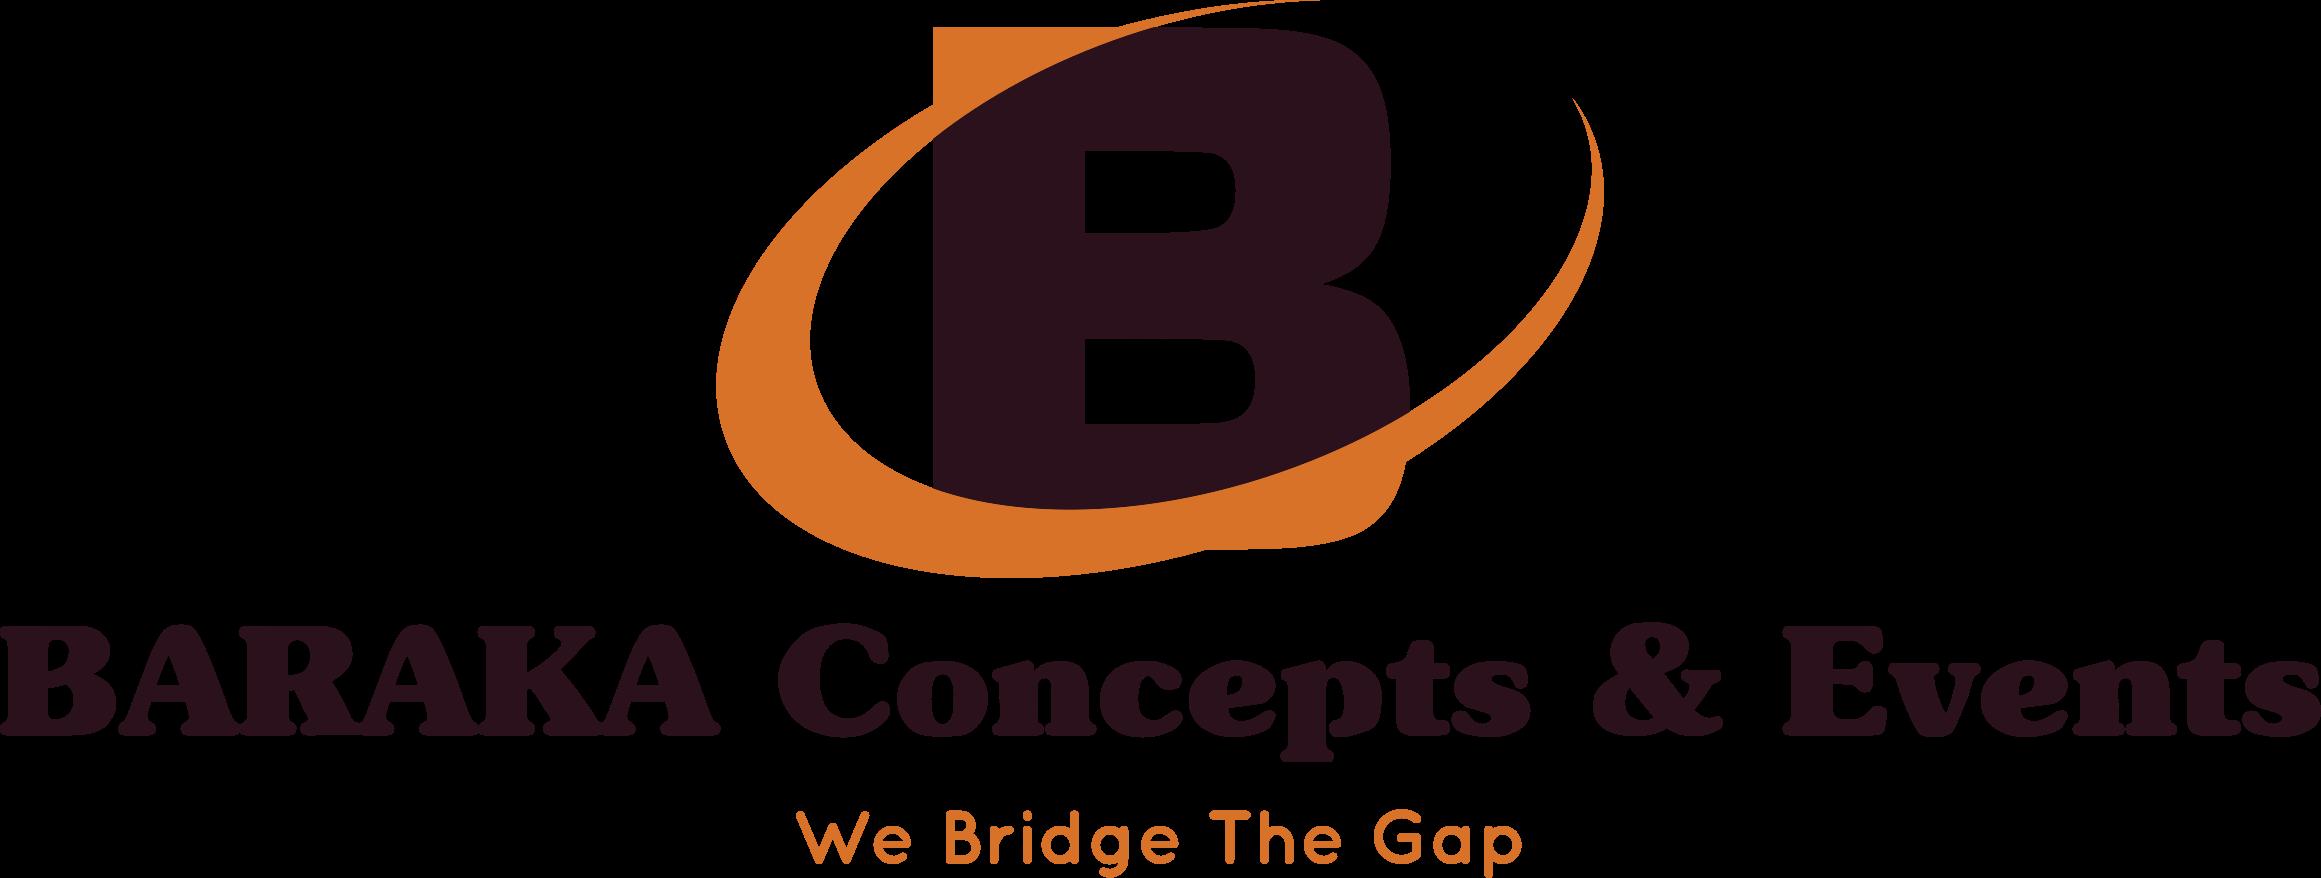 BARAKA Concepts and Events